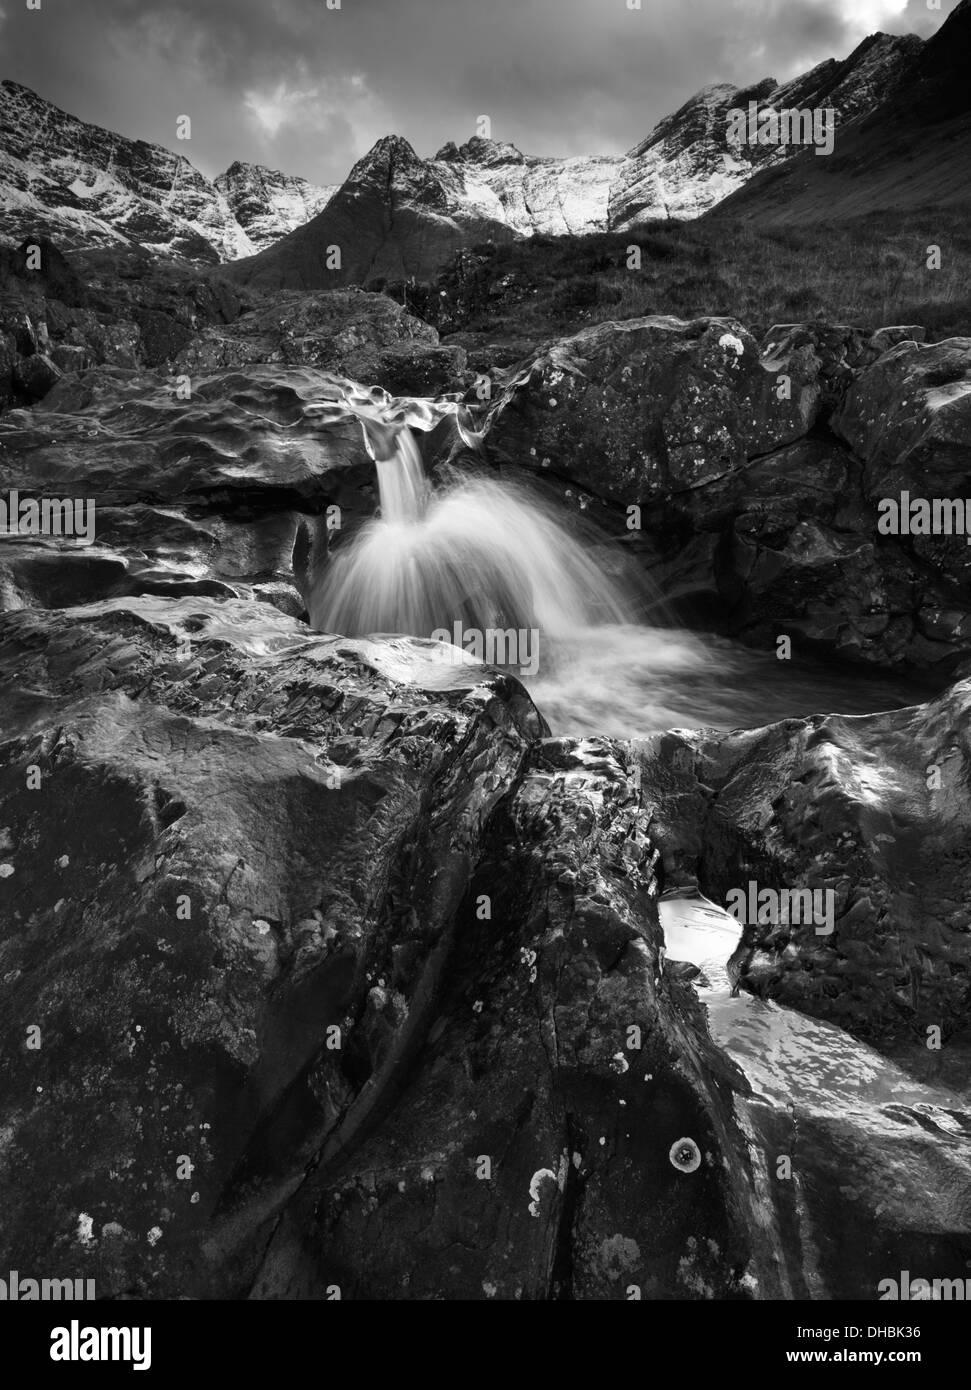 The dramatic scenery on the Fairy Pools walk in Glen Brittle, Isle of Skye, Scotland - Stock Image